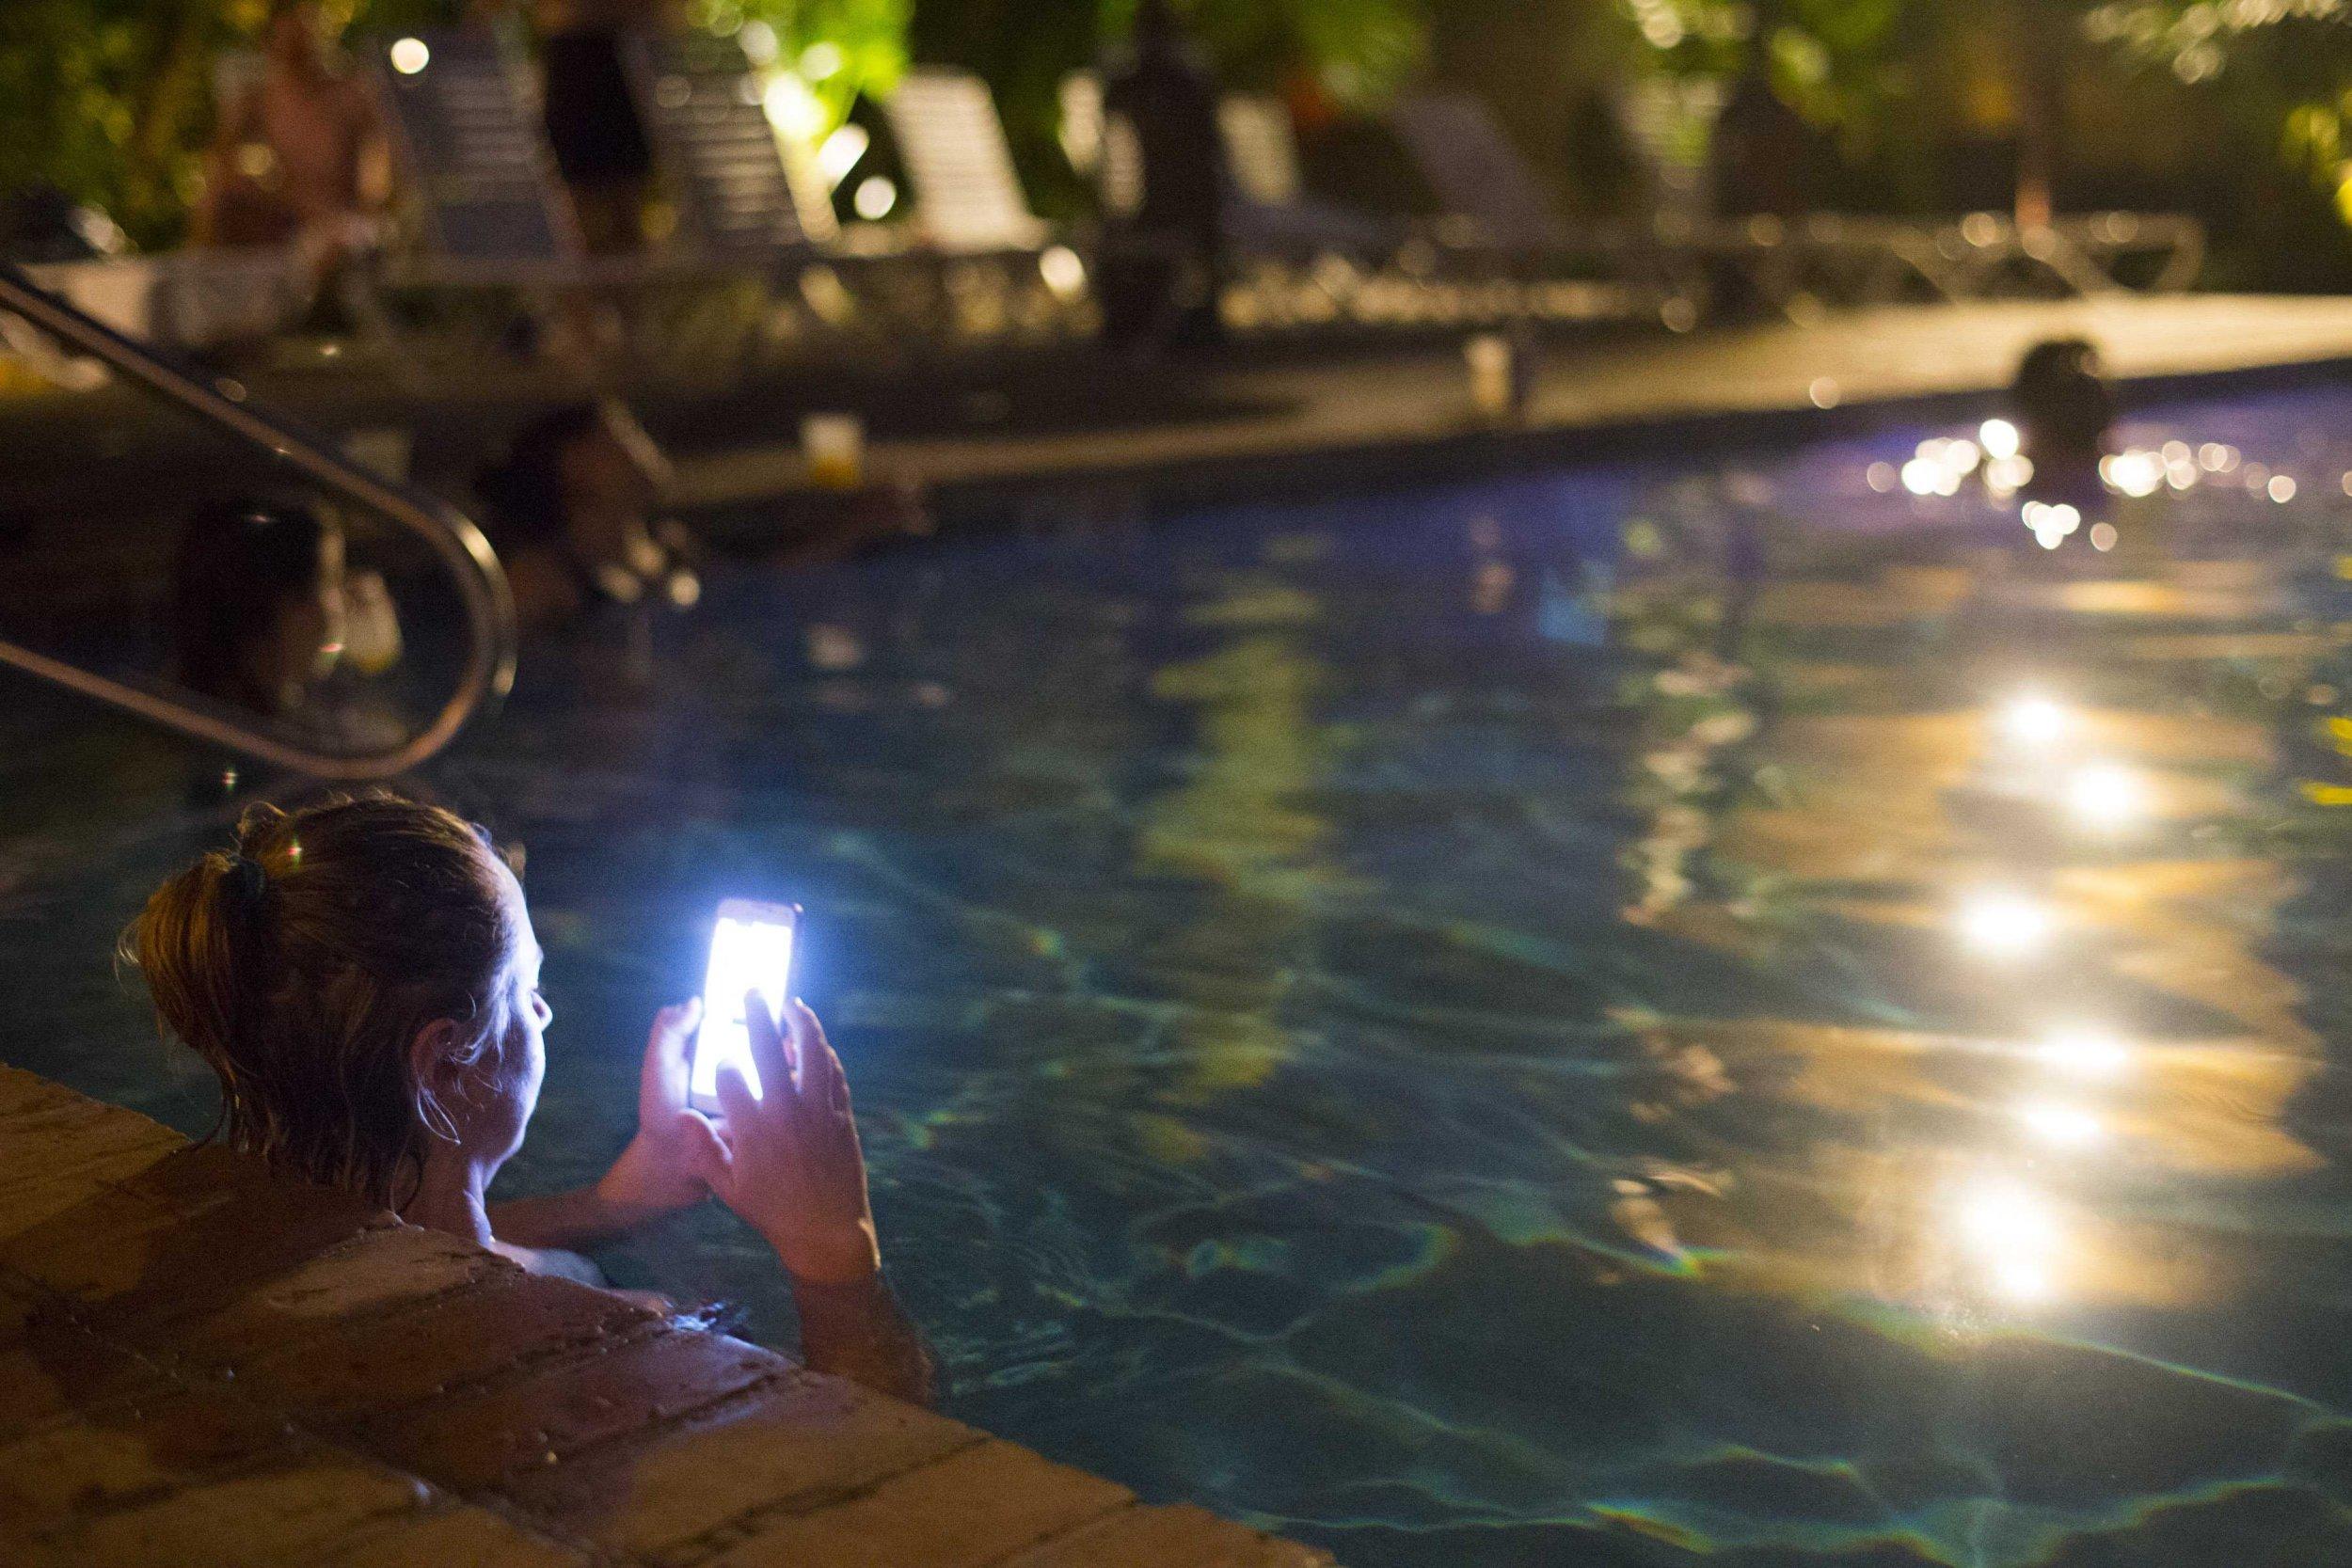 Phone at public pool